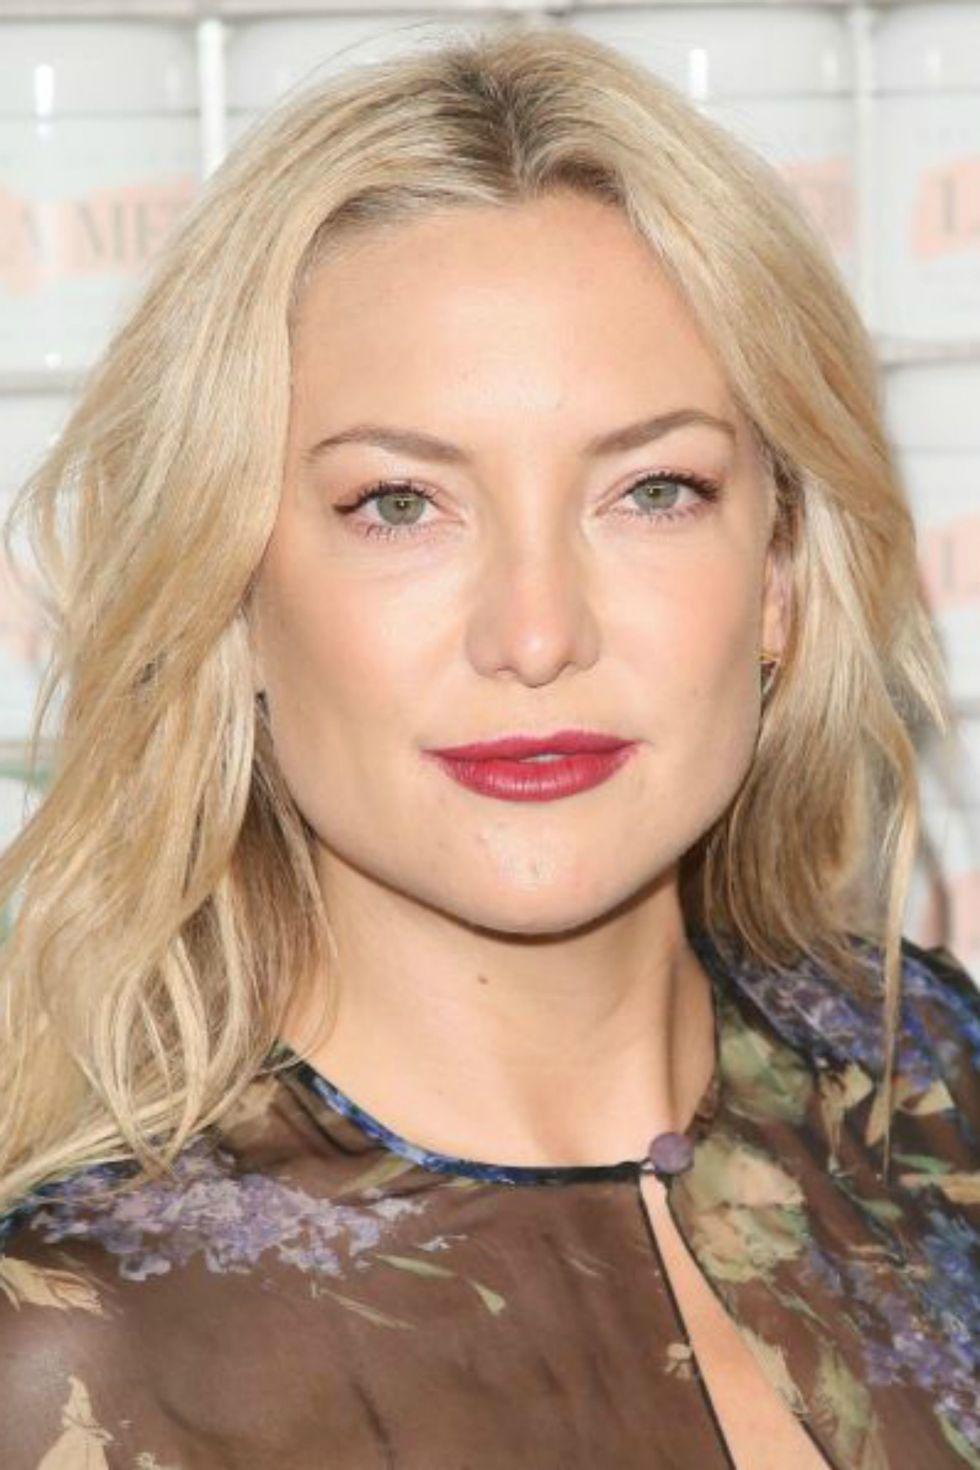 19 celebs with platinum blonde hair - how to get platinum blonde hair